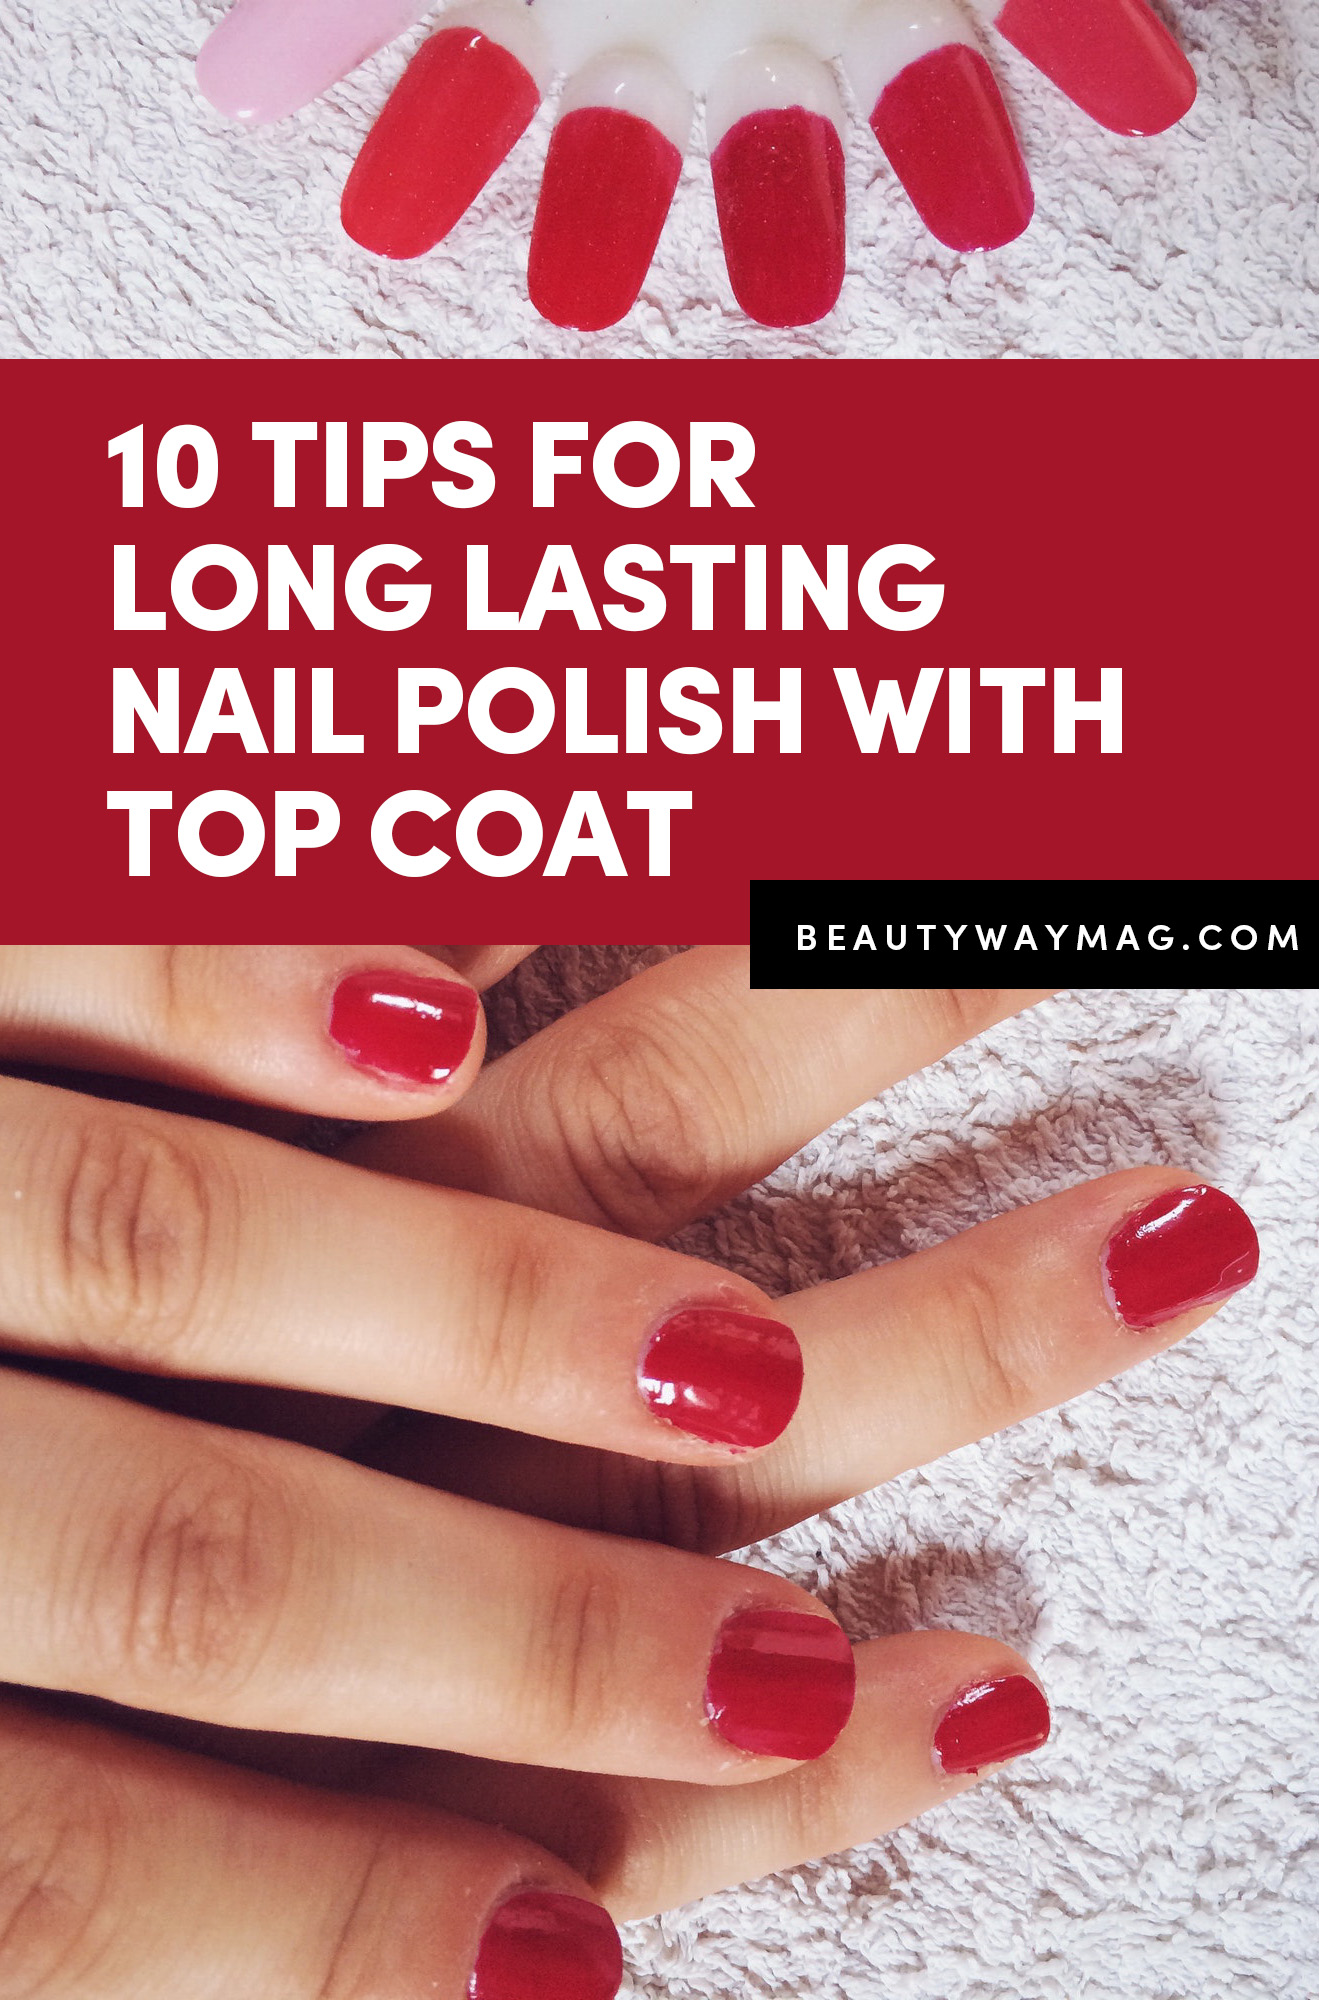 10 Tips For Long Lasting Nail polish With Top Coat